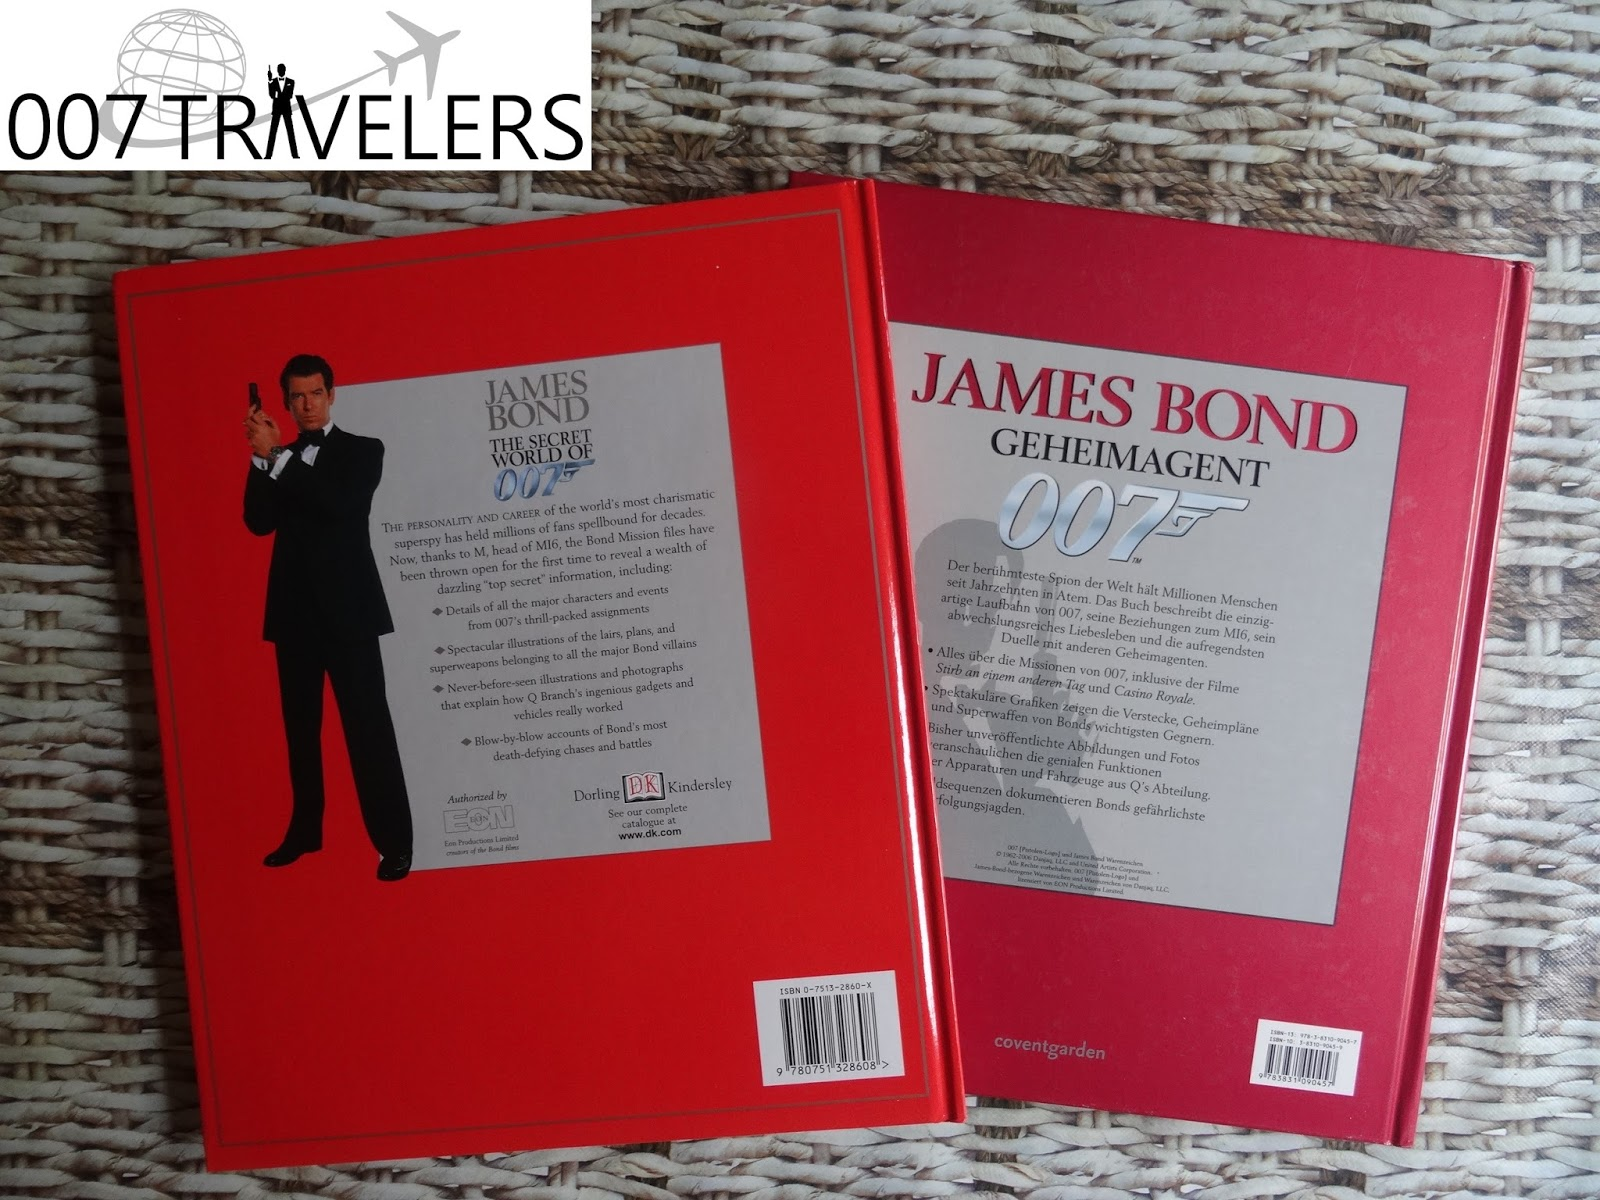 Creators of the Bond films